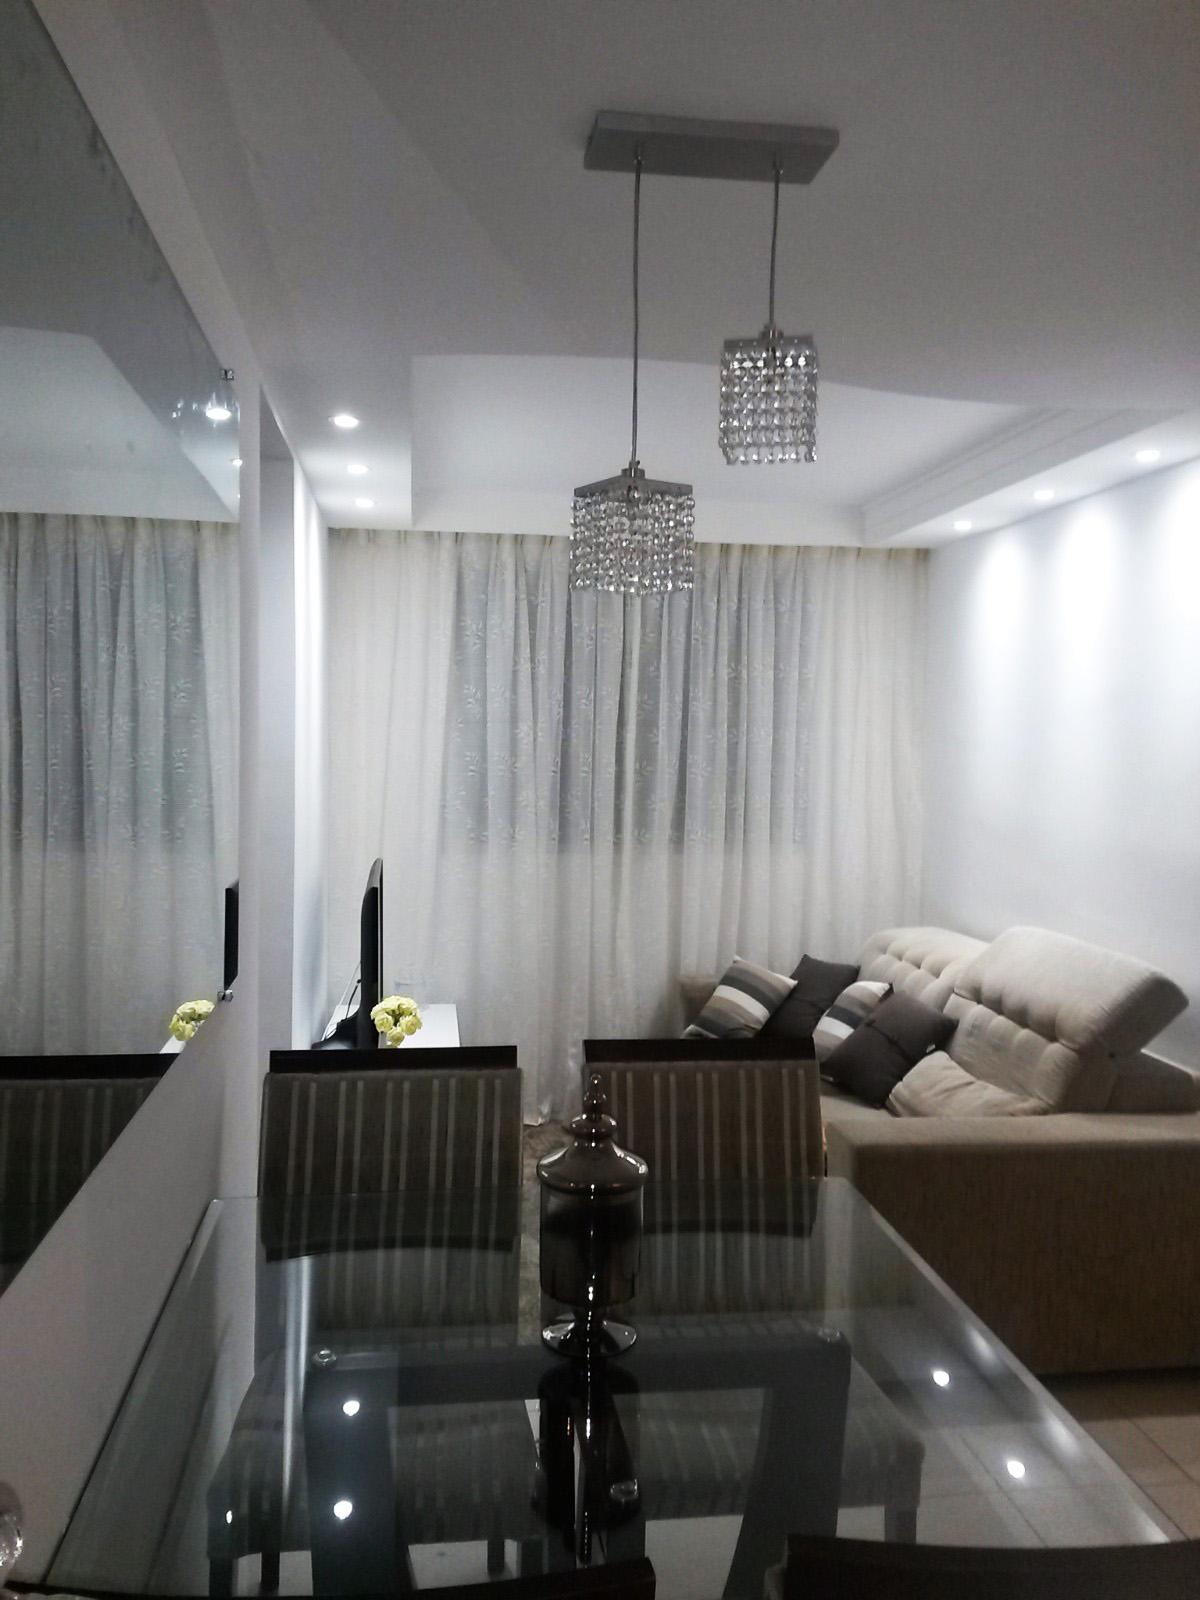 Cozinha Americana Drywall Best Lights With Cozinha Americana